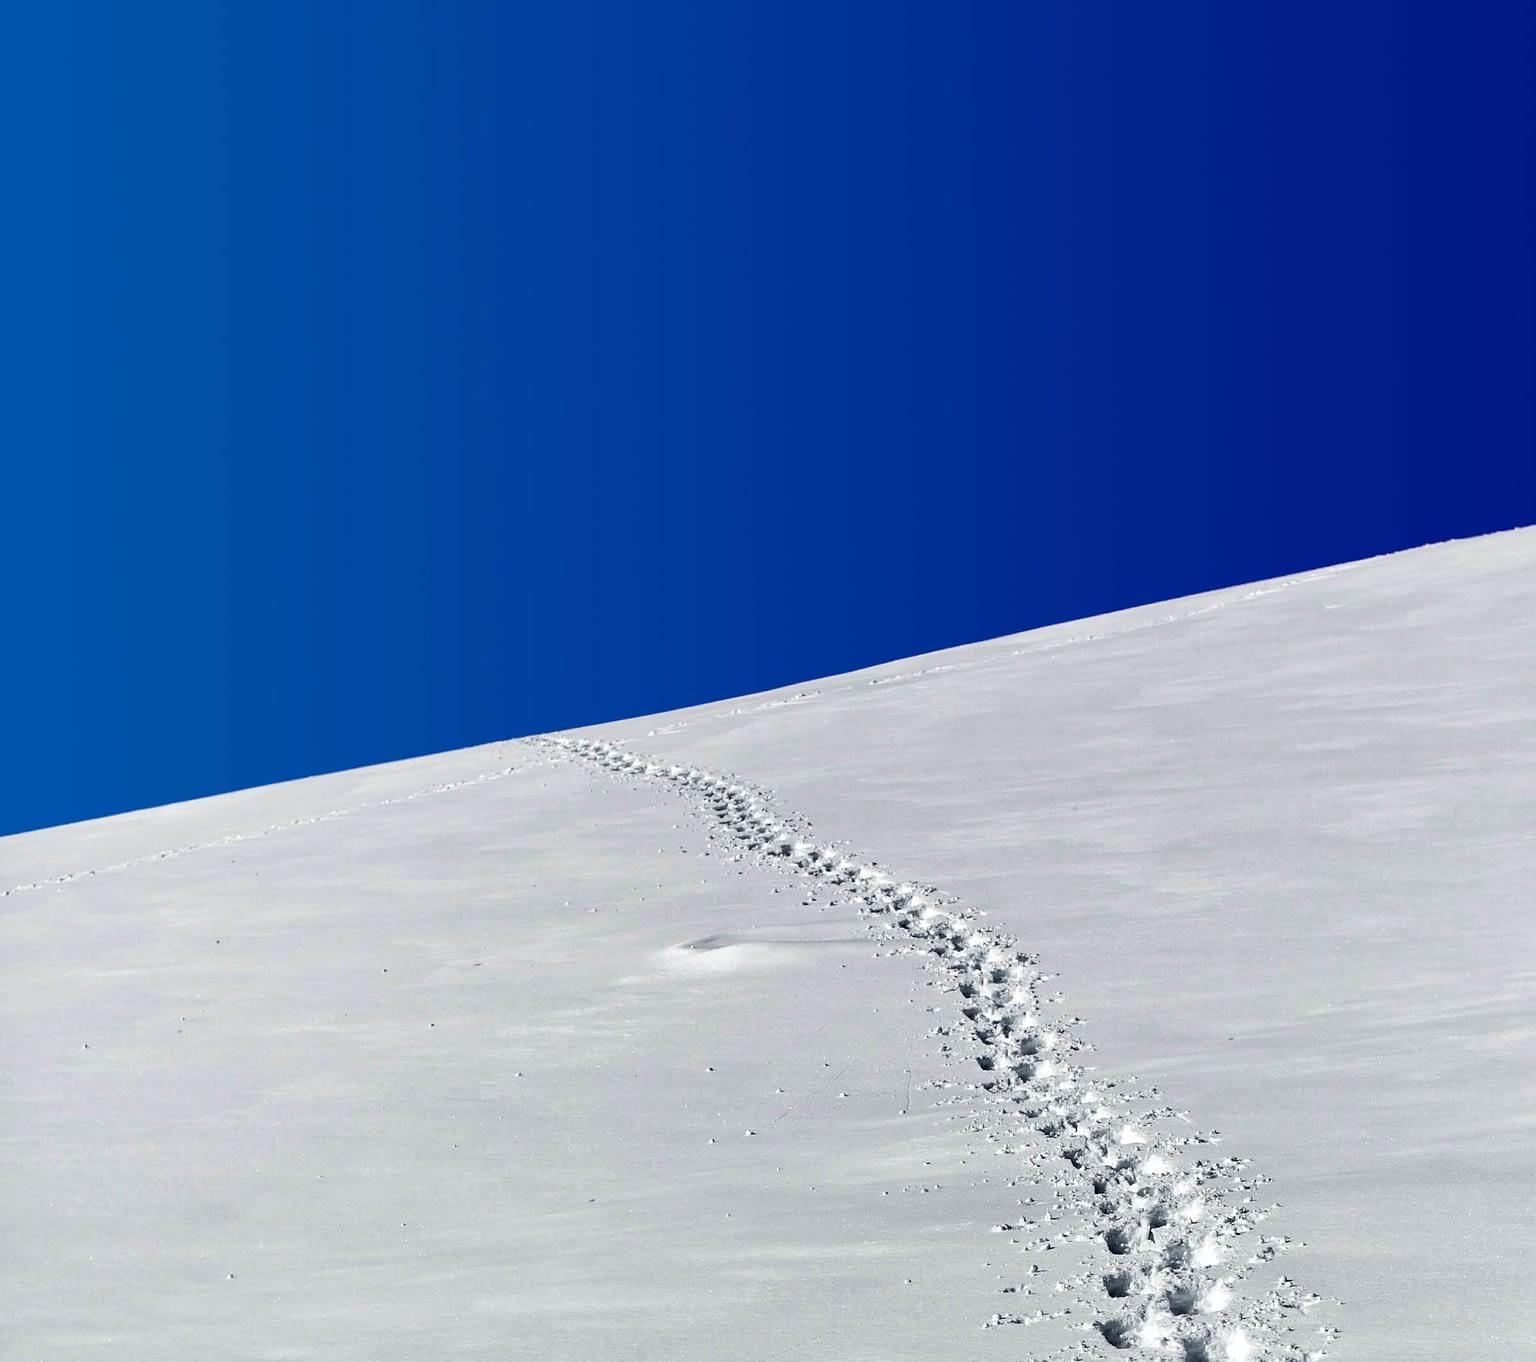 Footprints_In_The_Snow_Blue_Sky